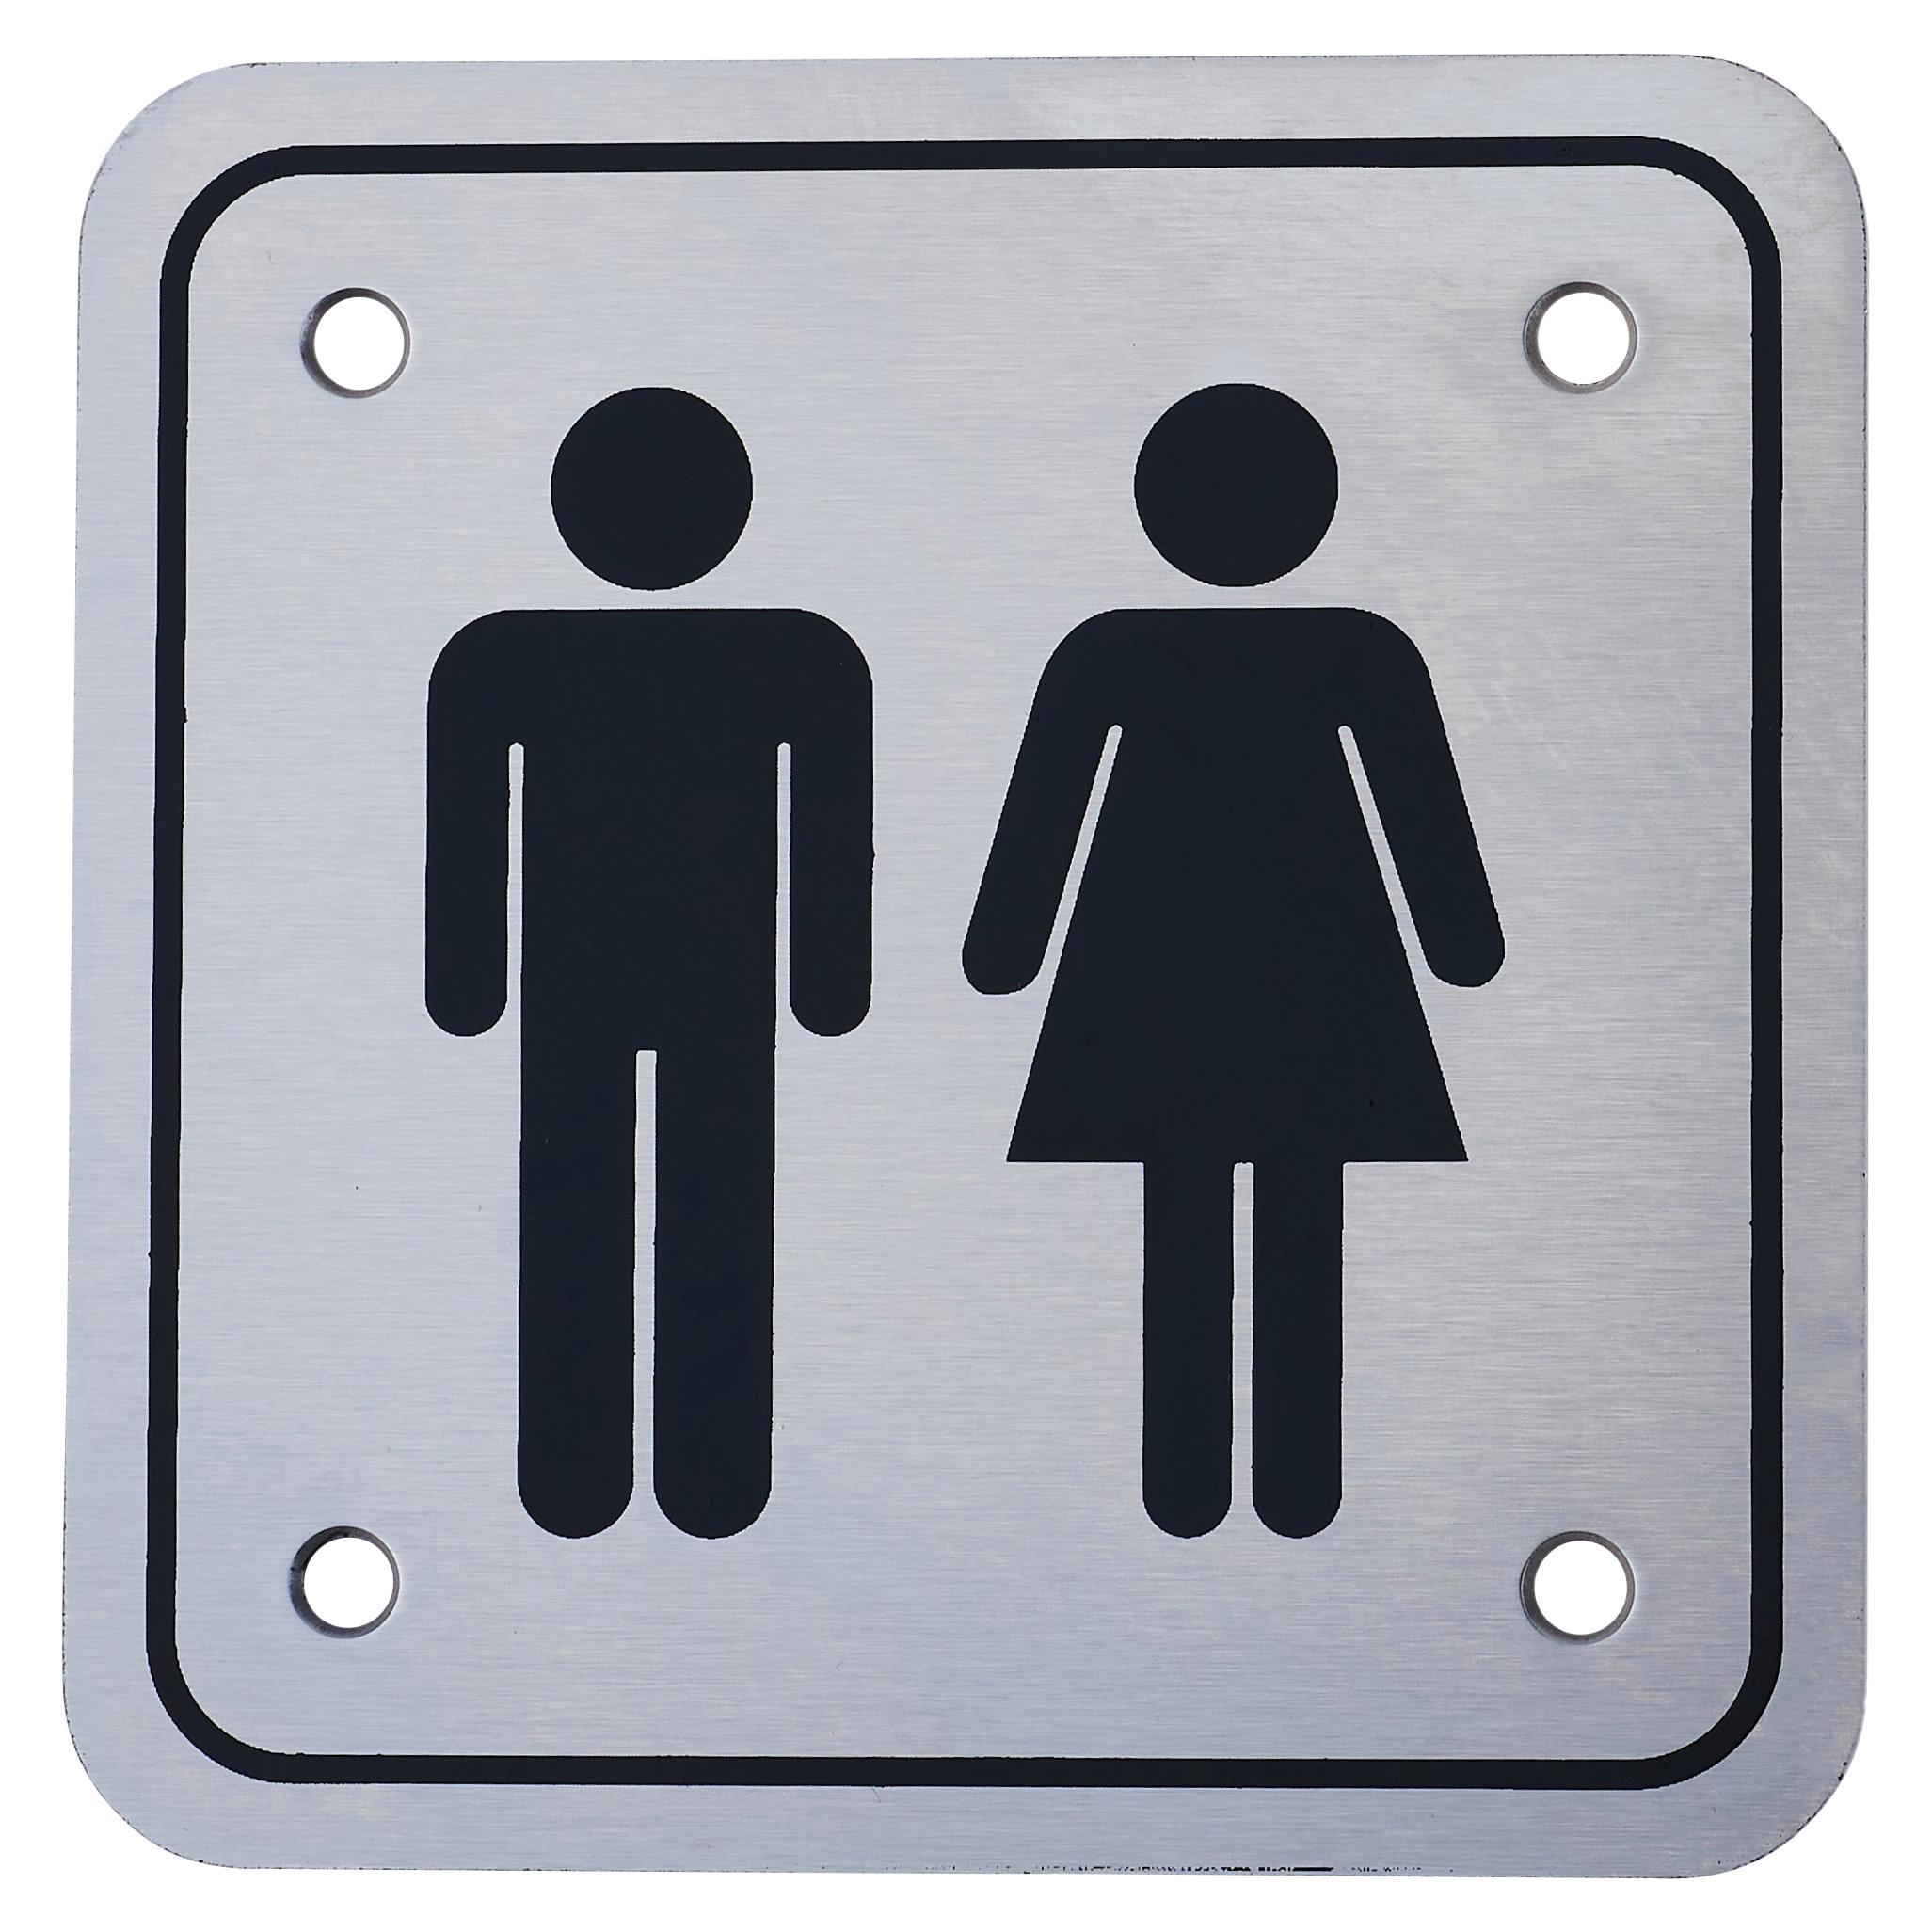 Unisex Square Toilet Door Sign - 100 x 100mm - Satin Stainless Steel)